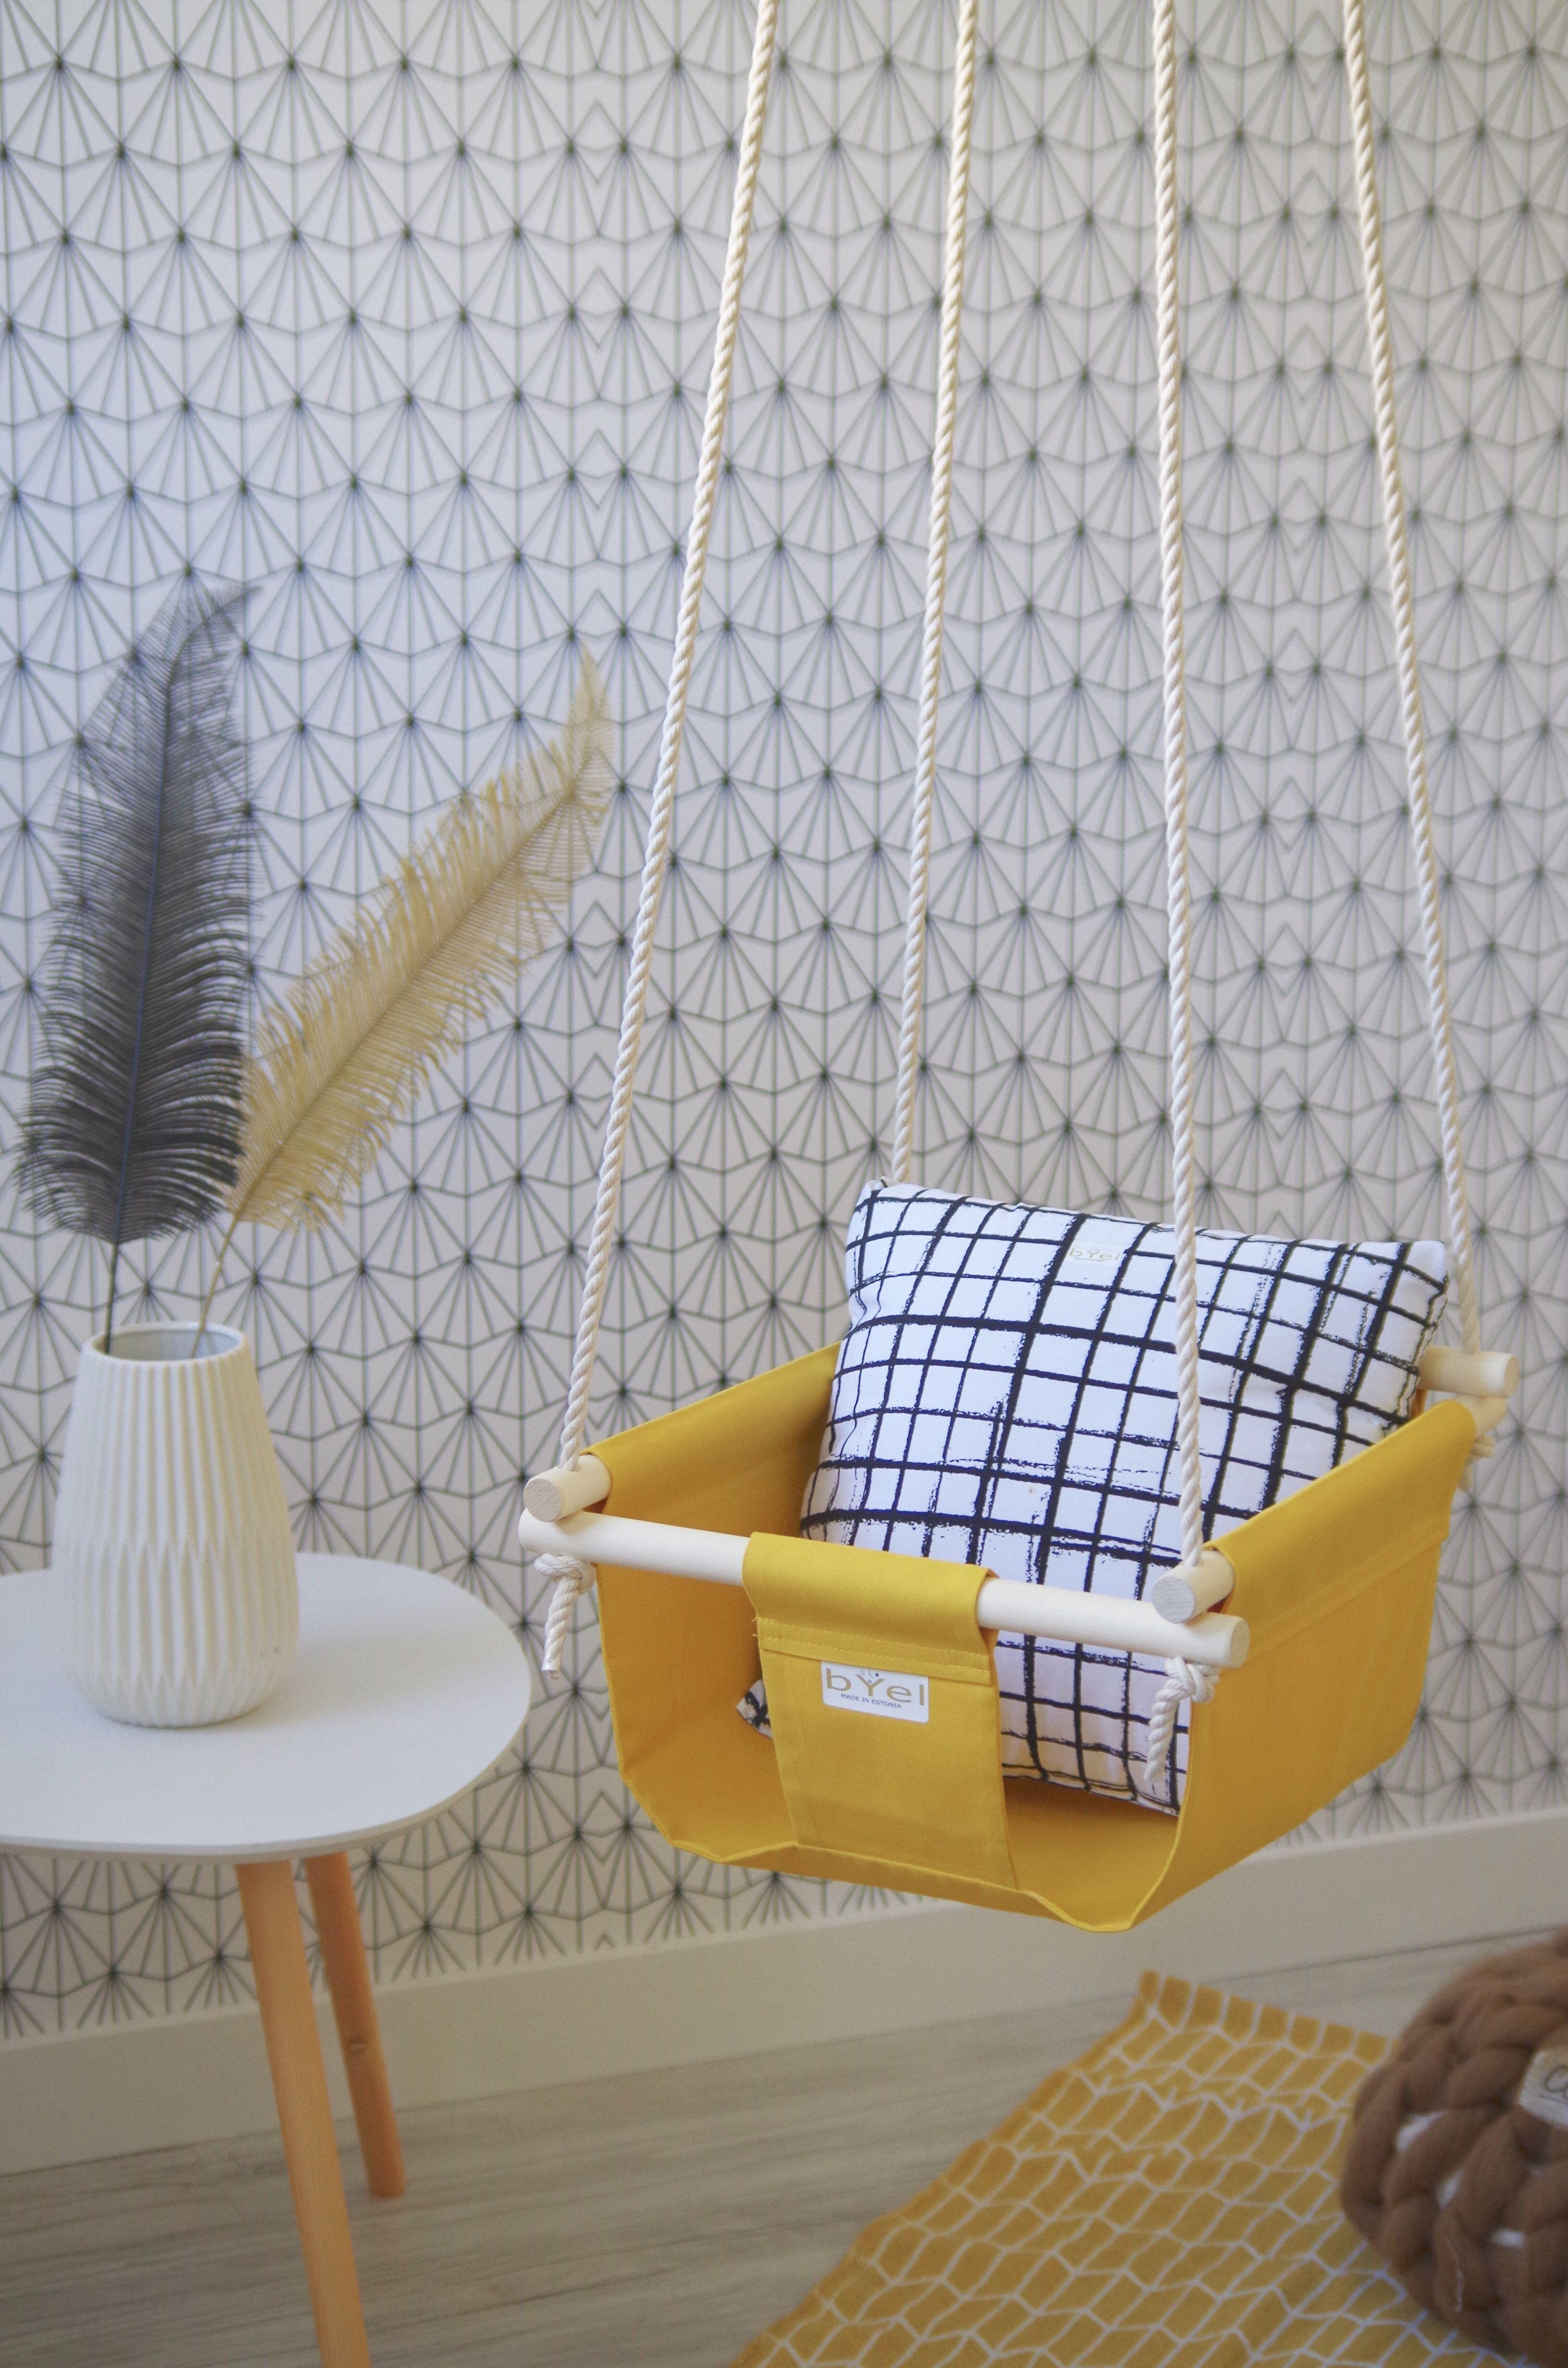 birthday baby decor gift present boho swing indoor nursery first shower fun chair